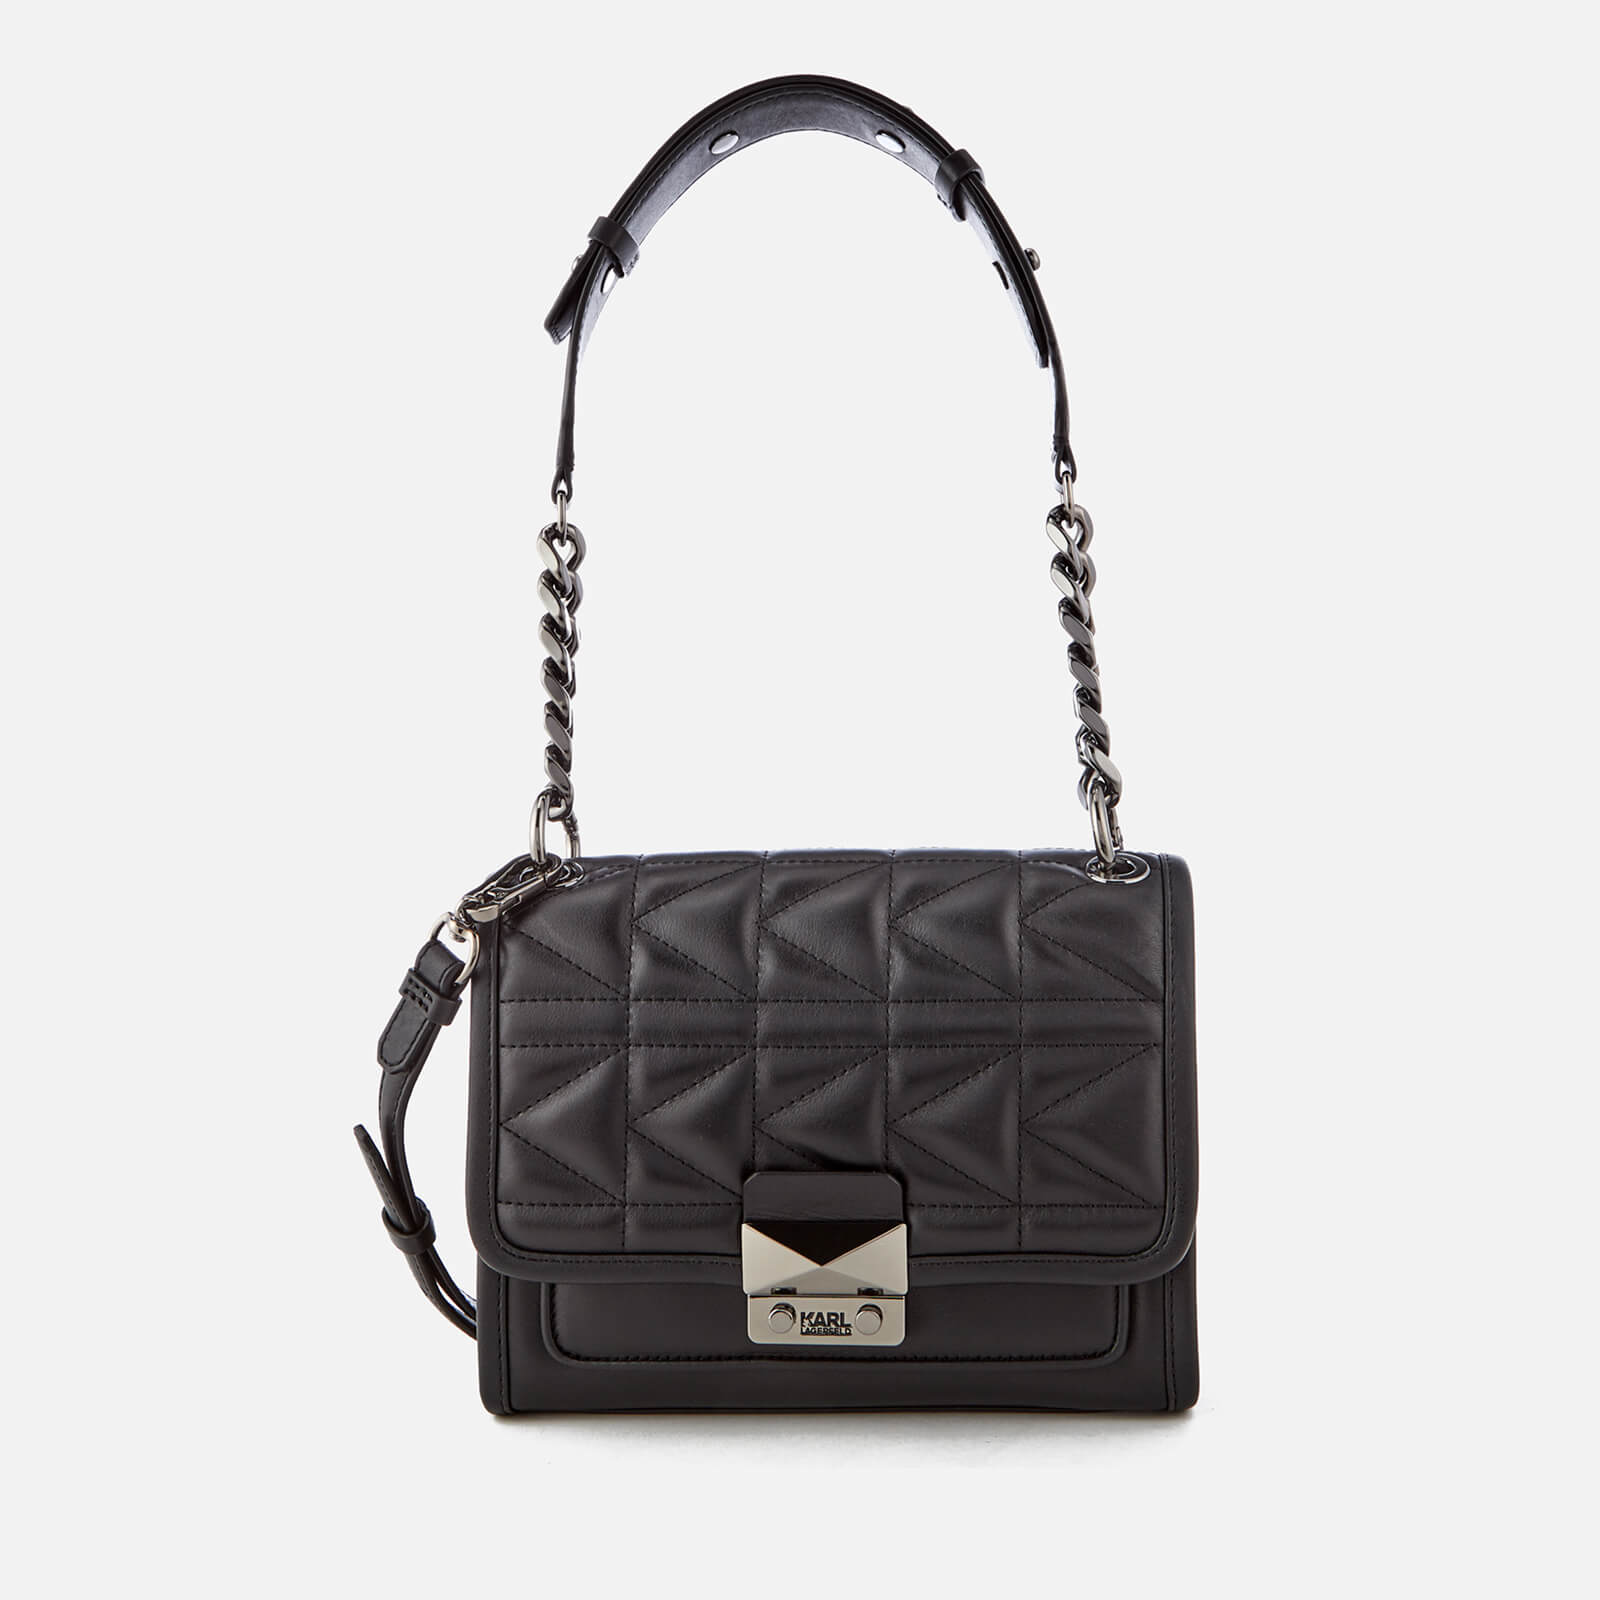 2cd1104fdcc4 Karl Lagerfeld Women s K Kuilted Mini Handbag - Black Gun metal - Free UK  Delivery over £50